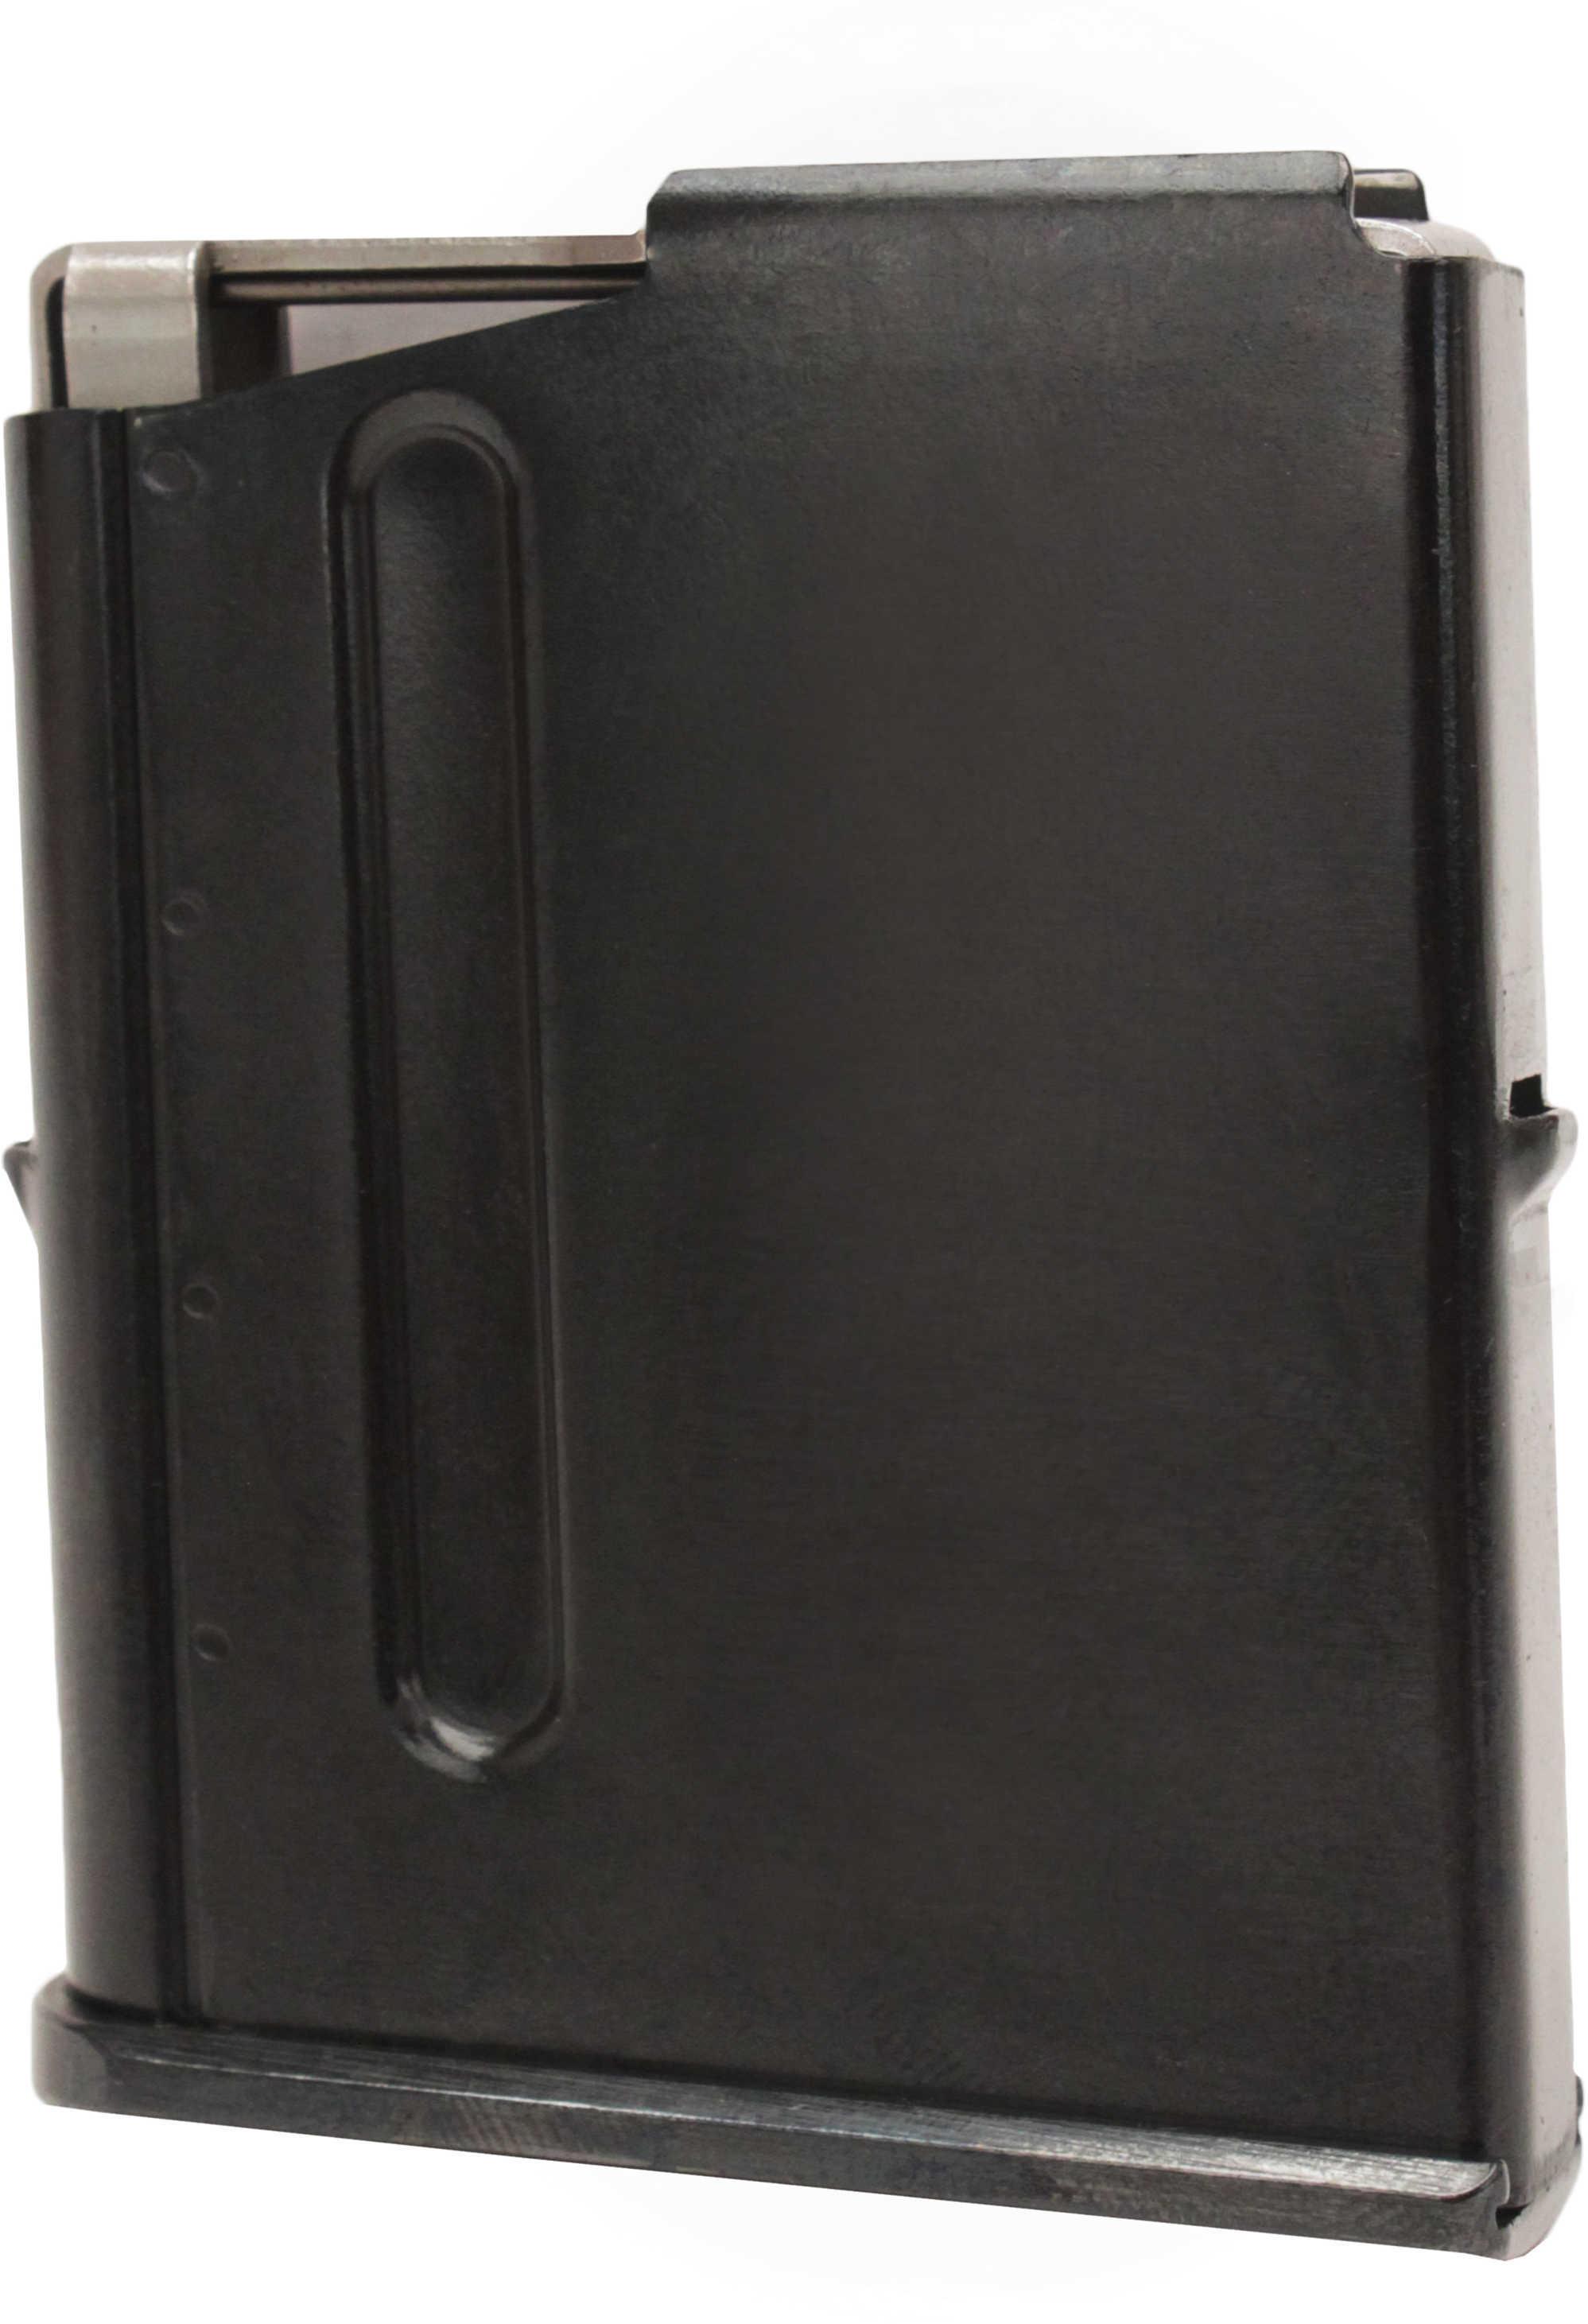 CZ Magazine 7.62X39 5Rd CZ 527 Black Finish 13004